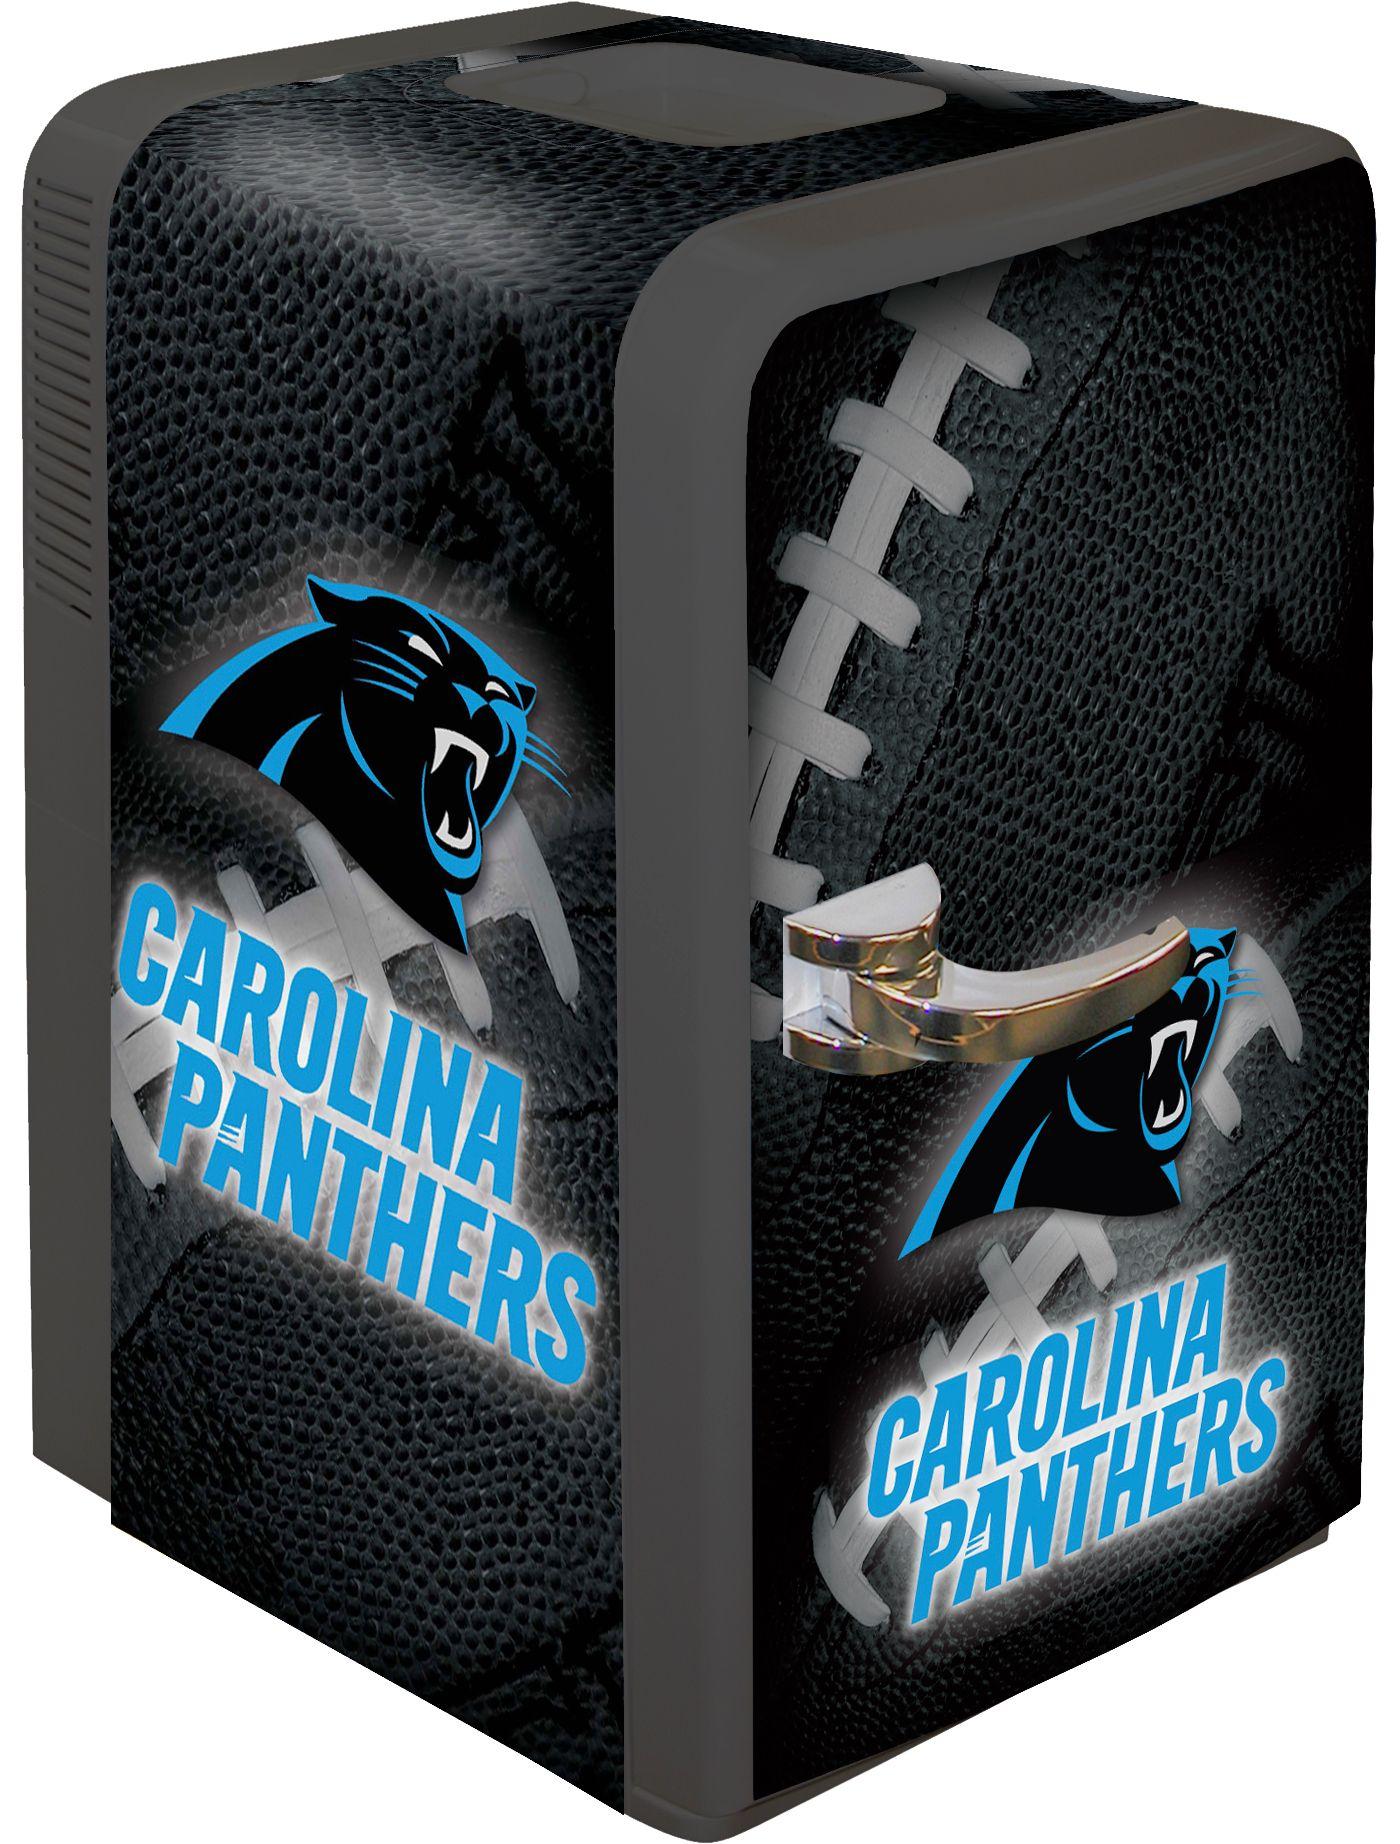 Boelter Carolina Panthers 15q Portable Party Refrigerator